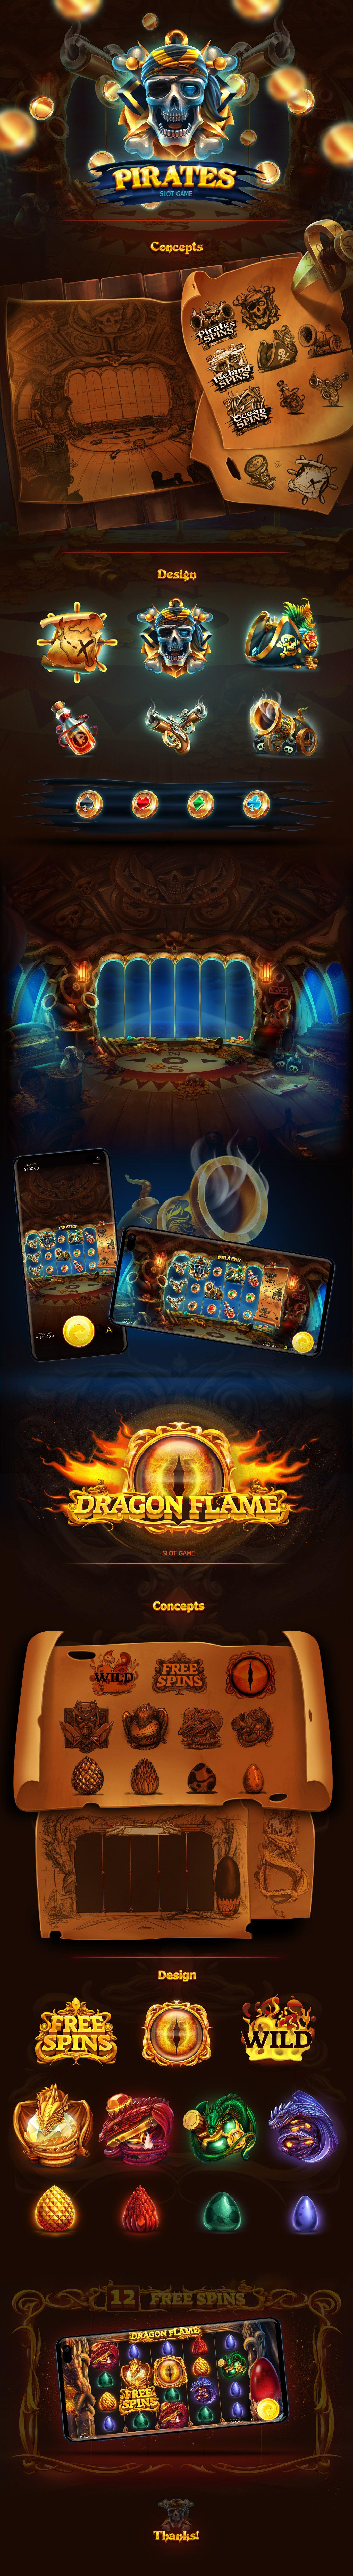 Behance Search Slot, Game design, Splash screen